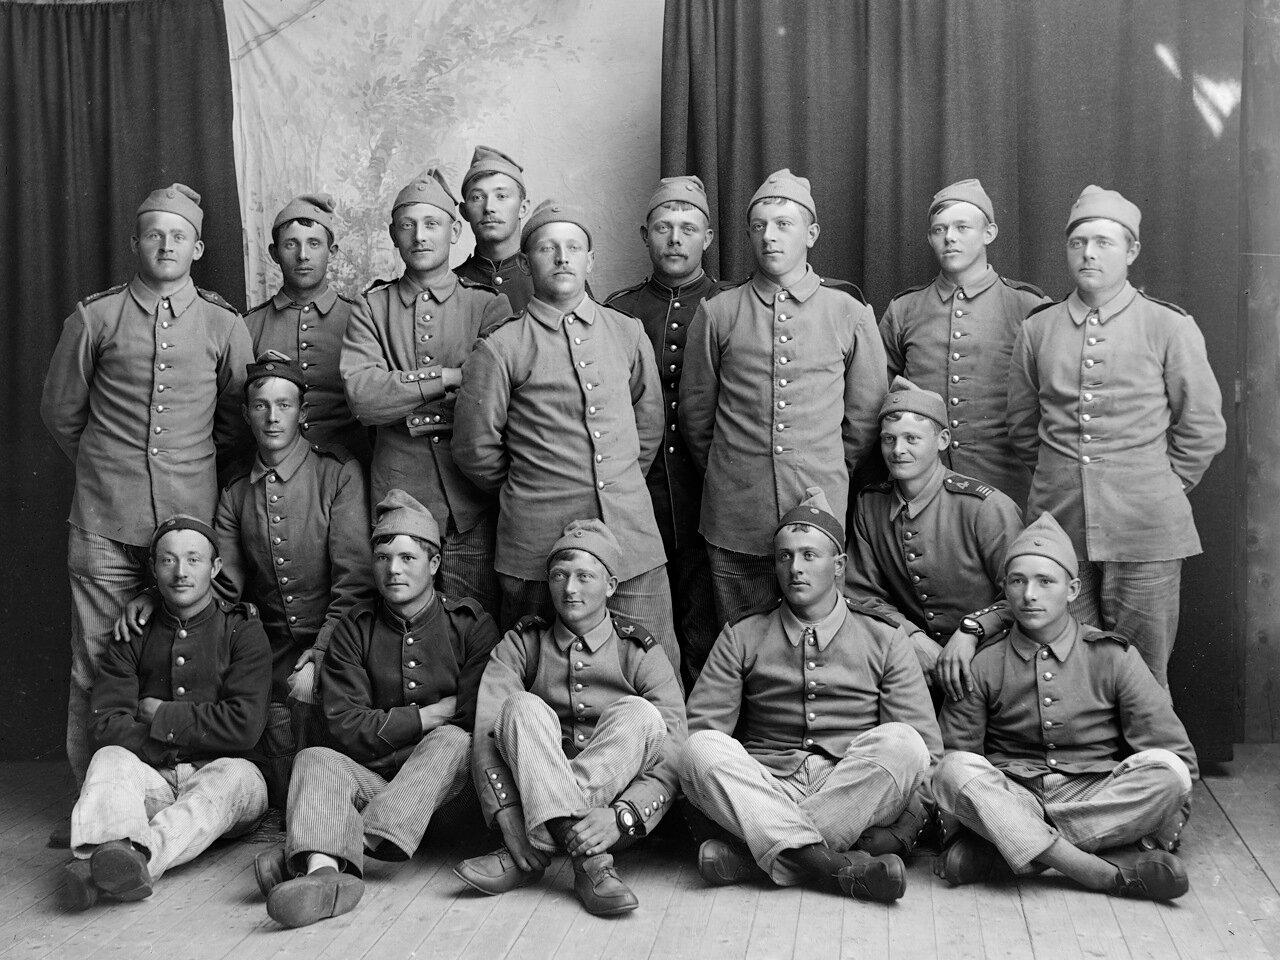 Группа солдат, ок. 1890-1910.